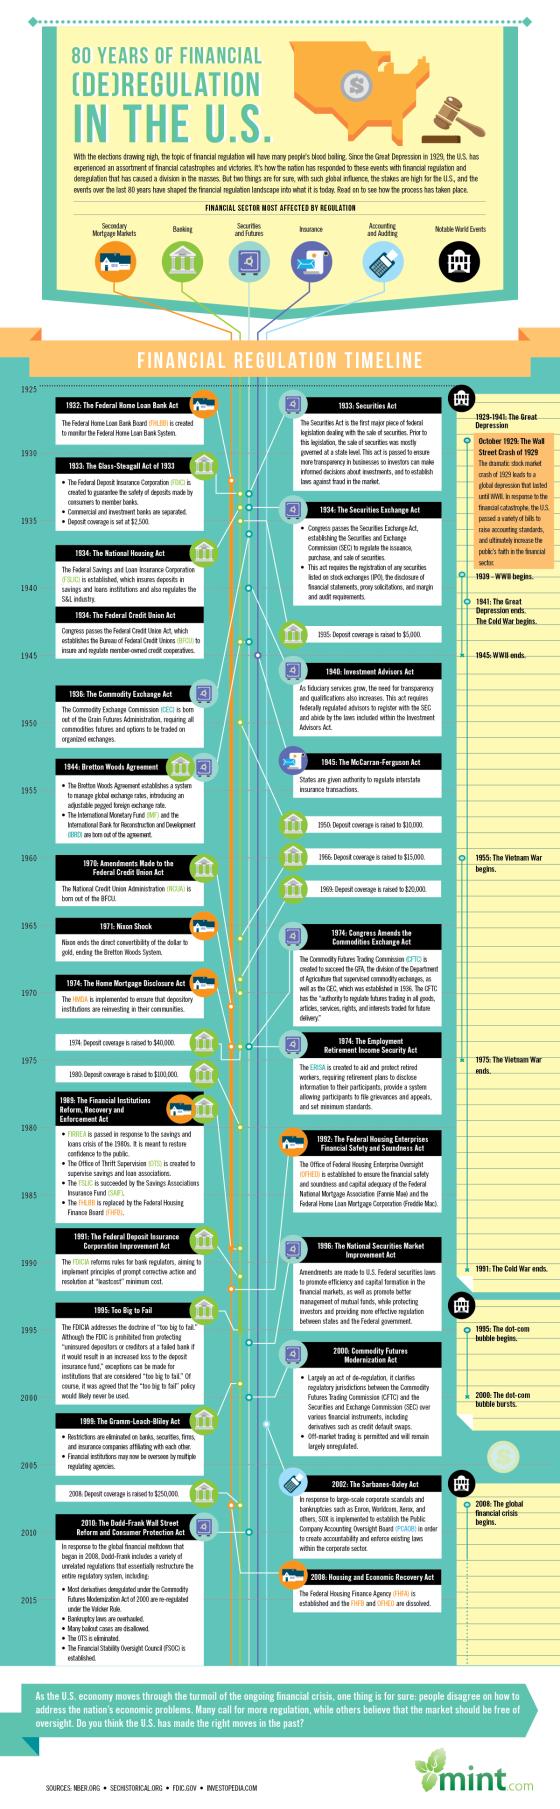 Infographic: 80 Years of Financial (de)Regulation in the U.S.